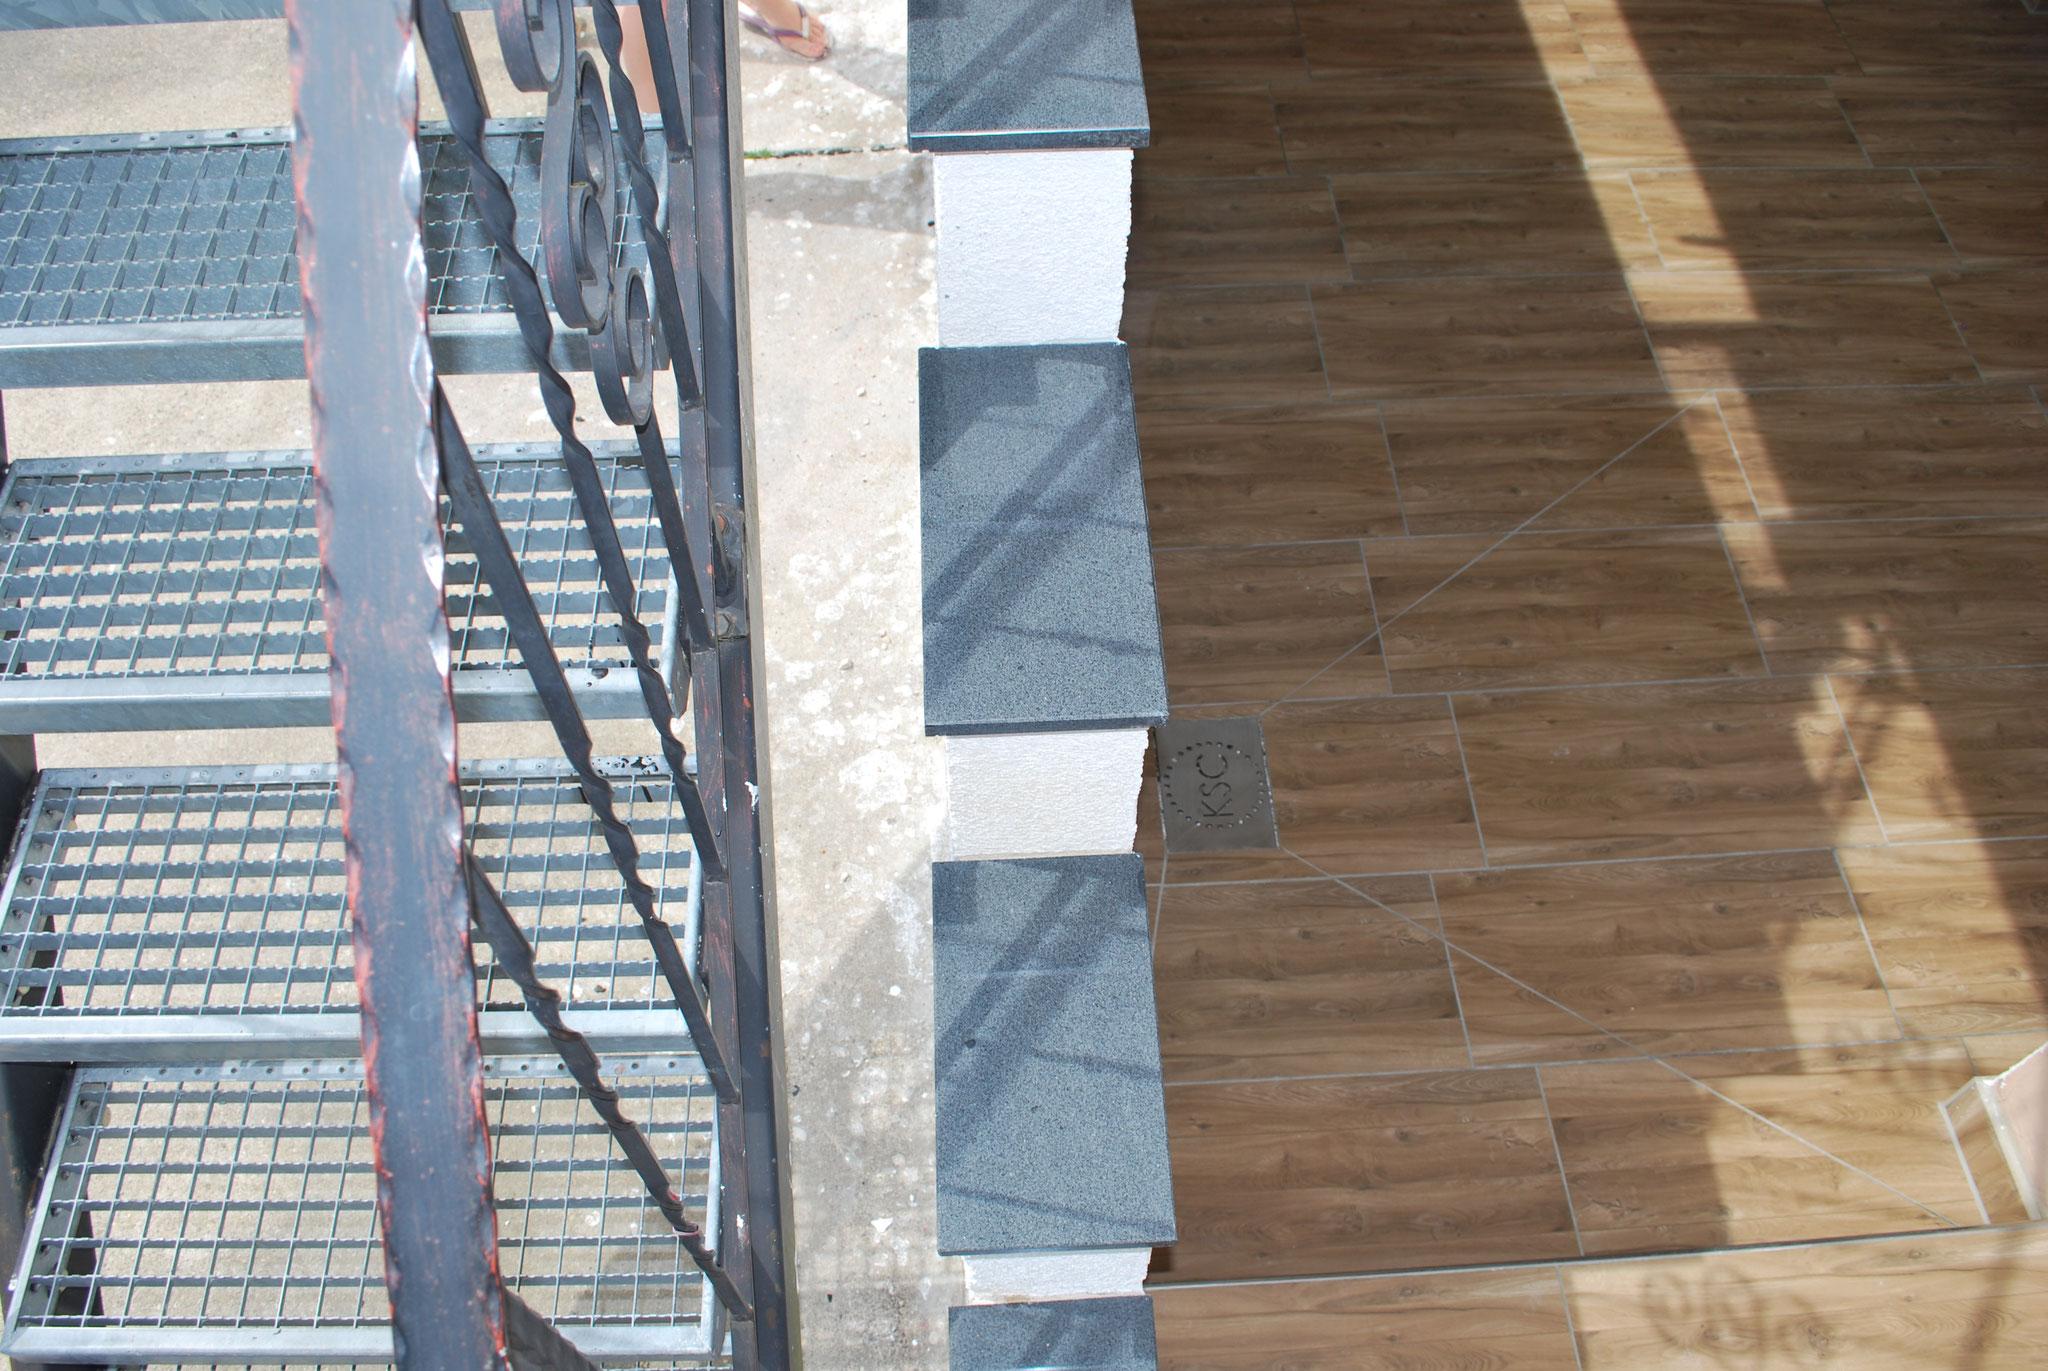 Granitplatten mit Tropfnase angebracht